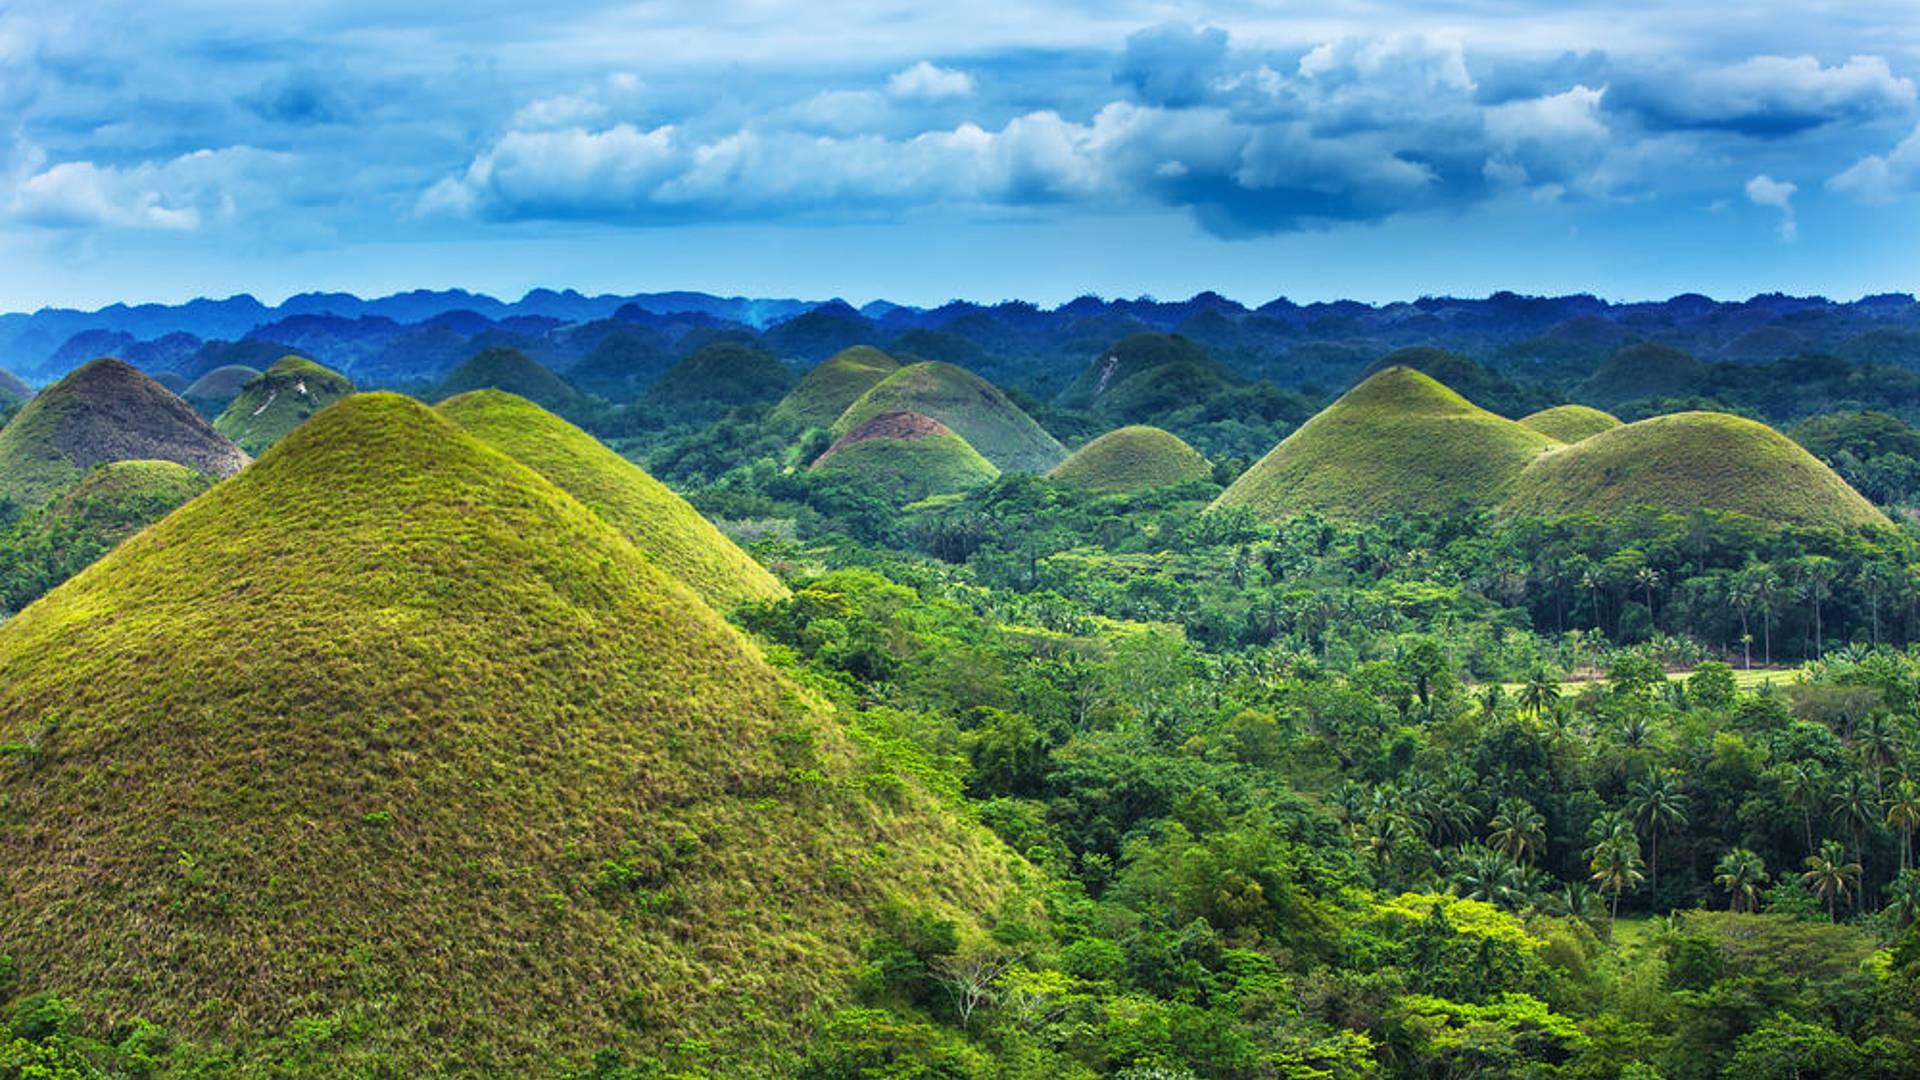 El gran Tour: Panglao, Bohol, Camiguin y Palawan